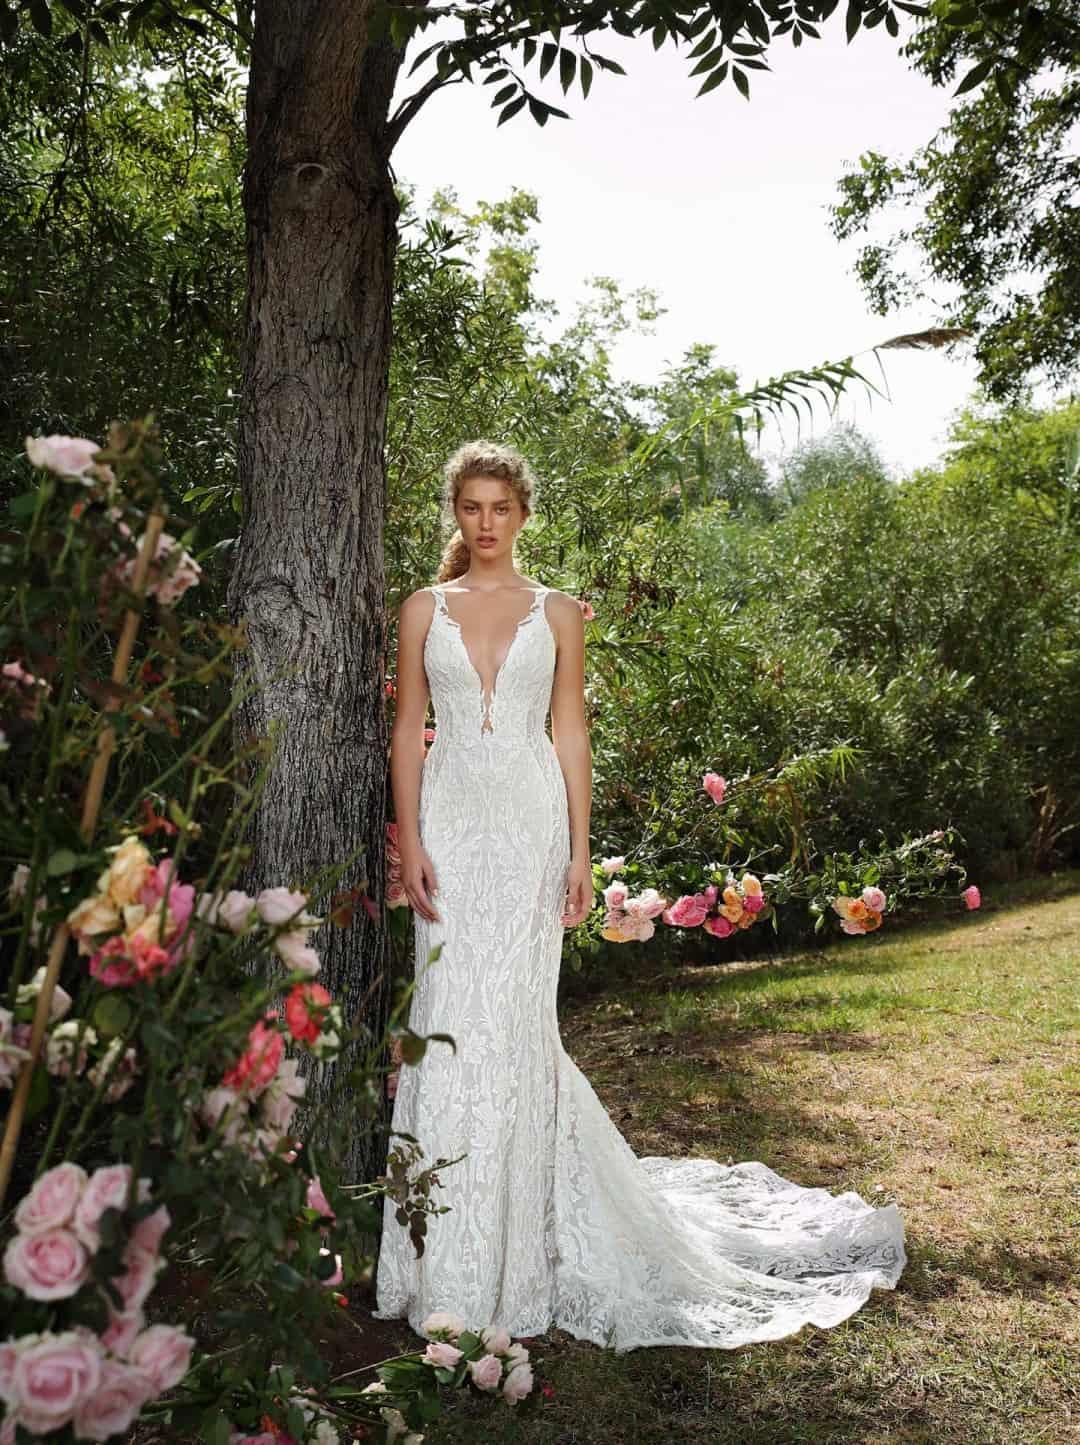 Haute Couture Brautkleider - G-207-front-long